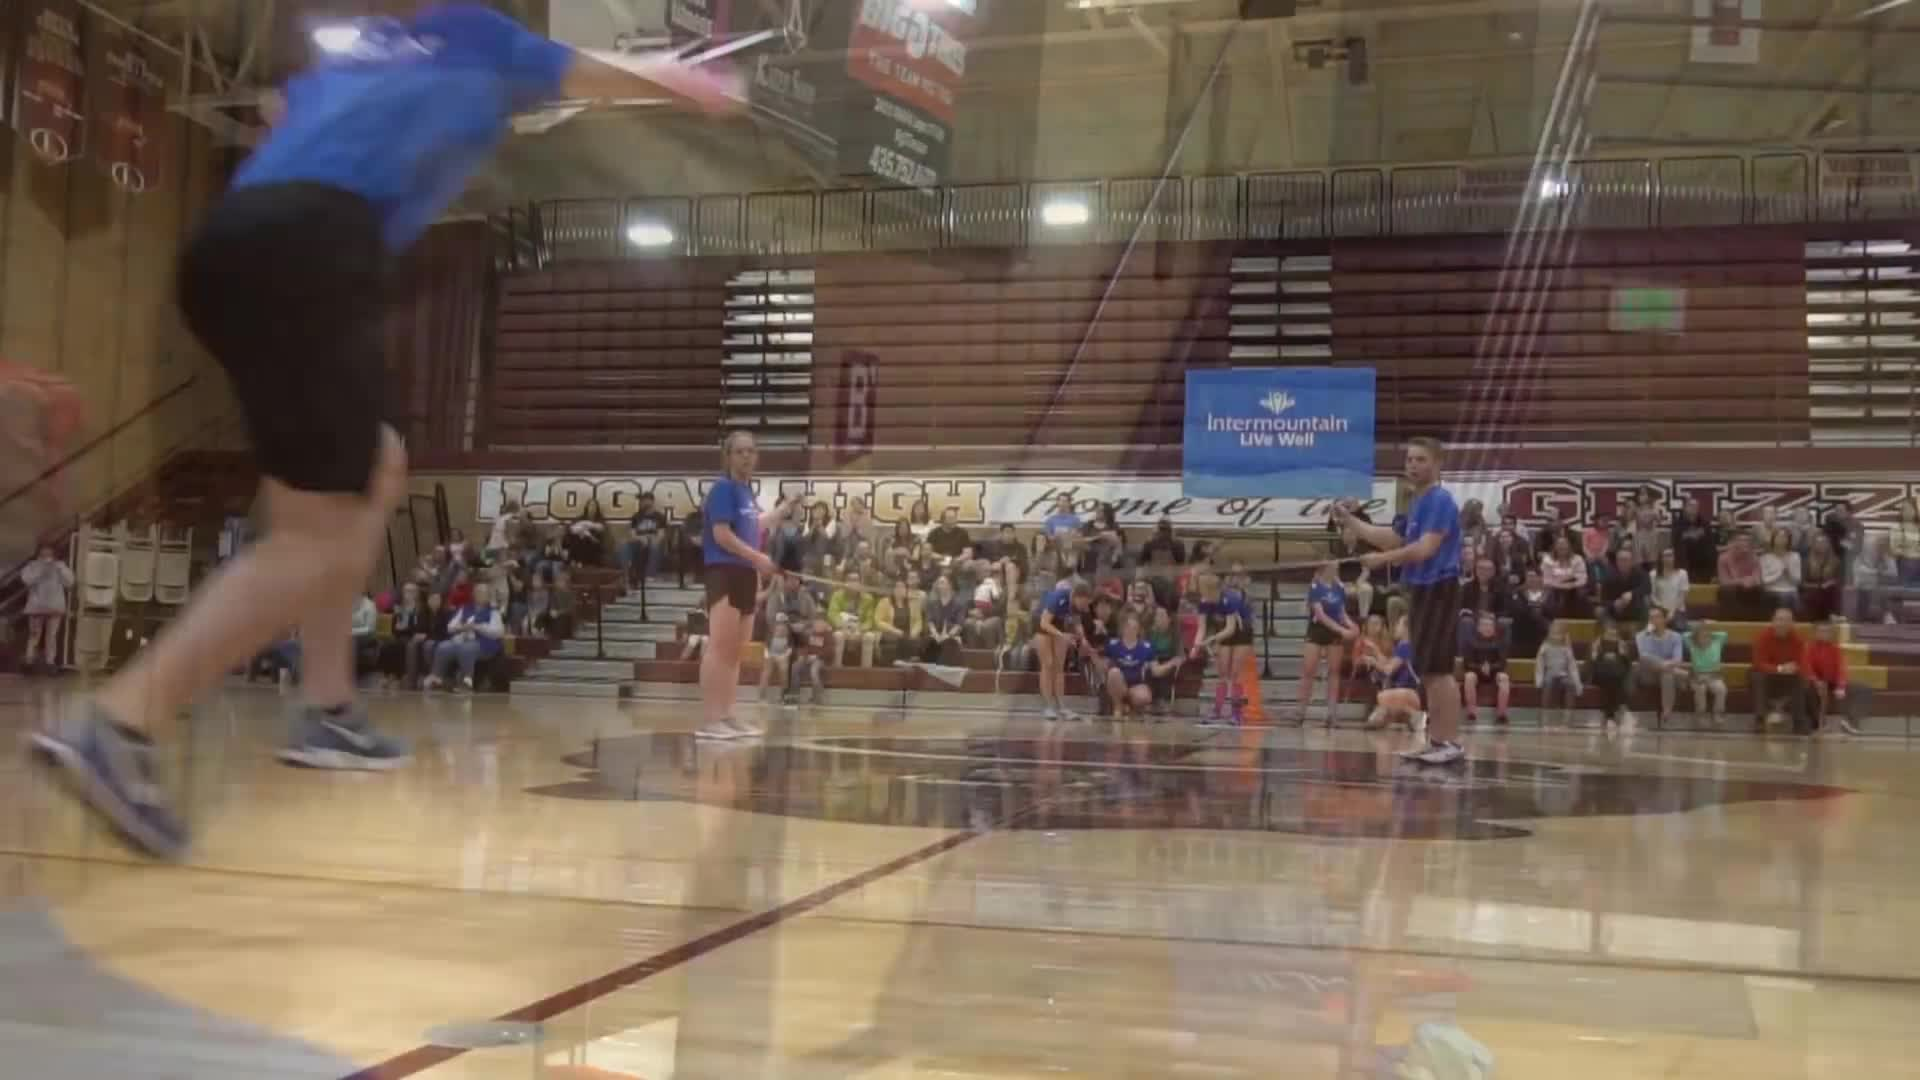 Film & Animation, WeJumpRope Music Videos, double dutch, flips, porter ballard, proform airborn, utah, wejumprope, JOLT 2019 - the BEST jump rope event in Utah GIFs